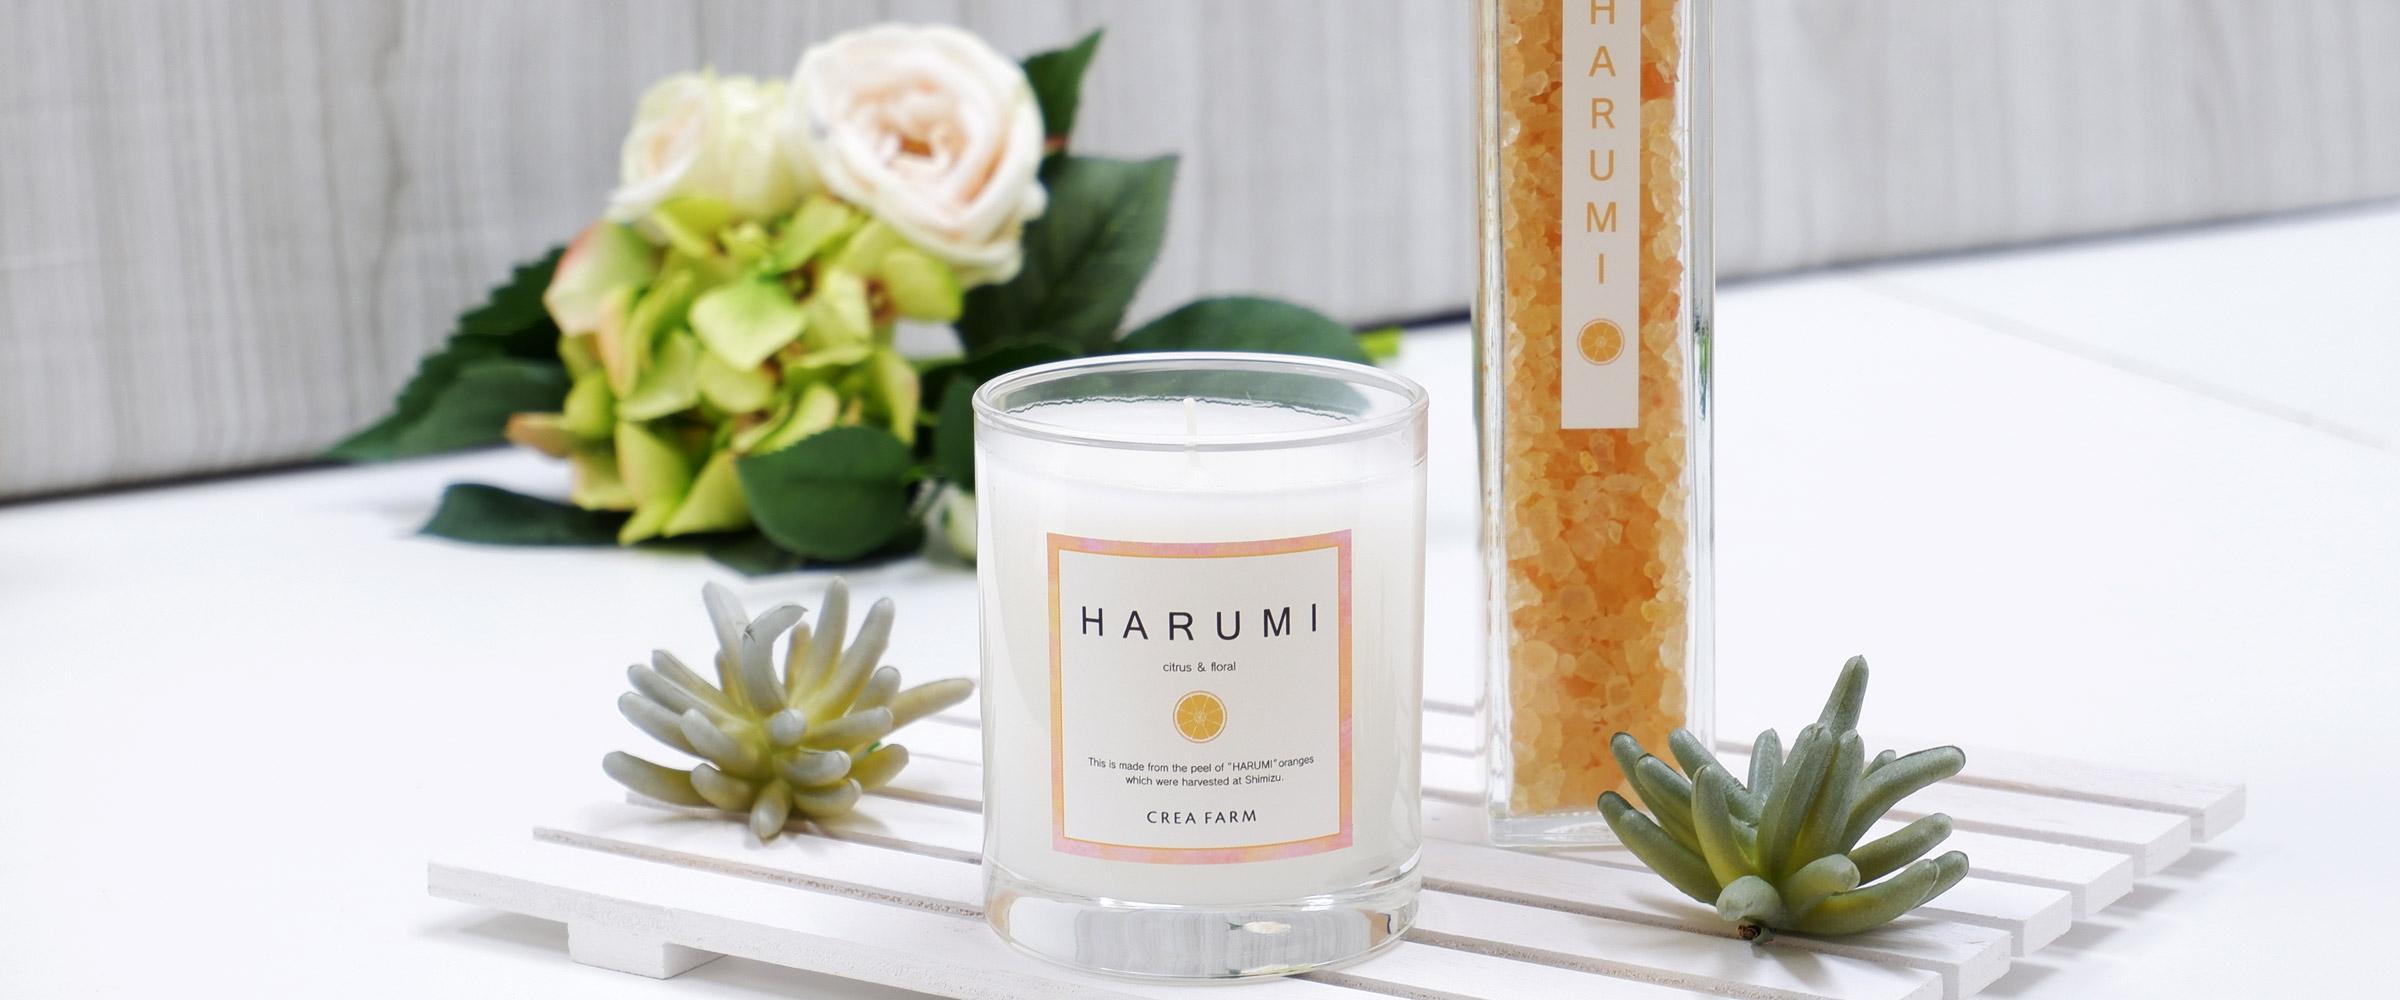 HARUMI アロマキャンドル&バスソルト